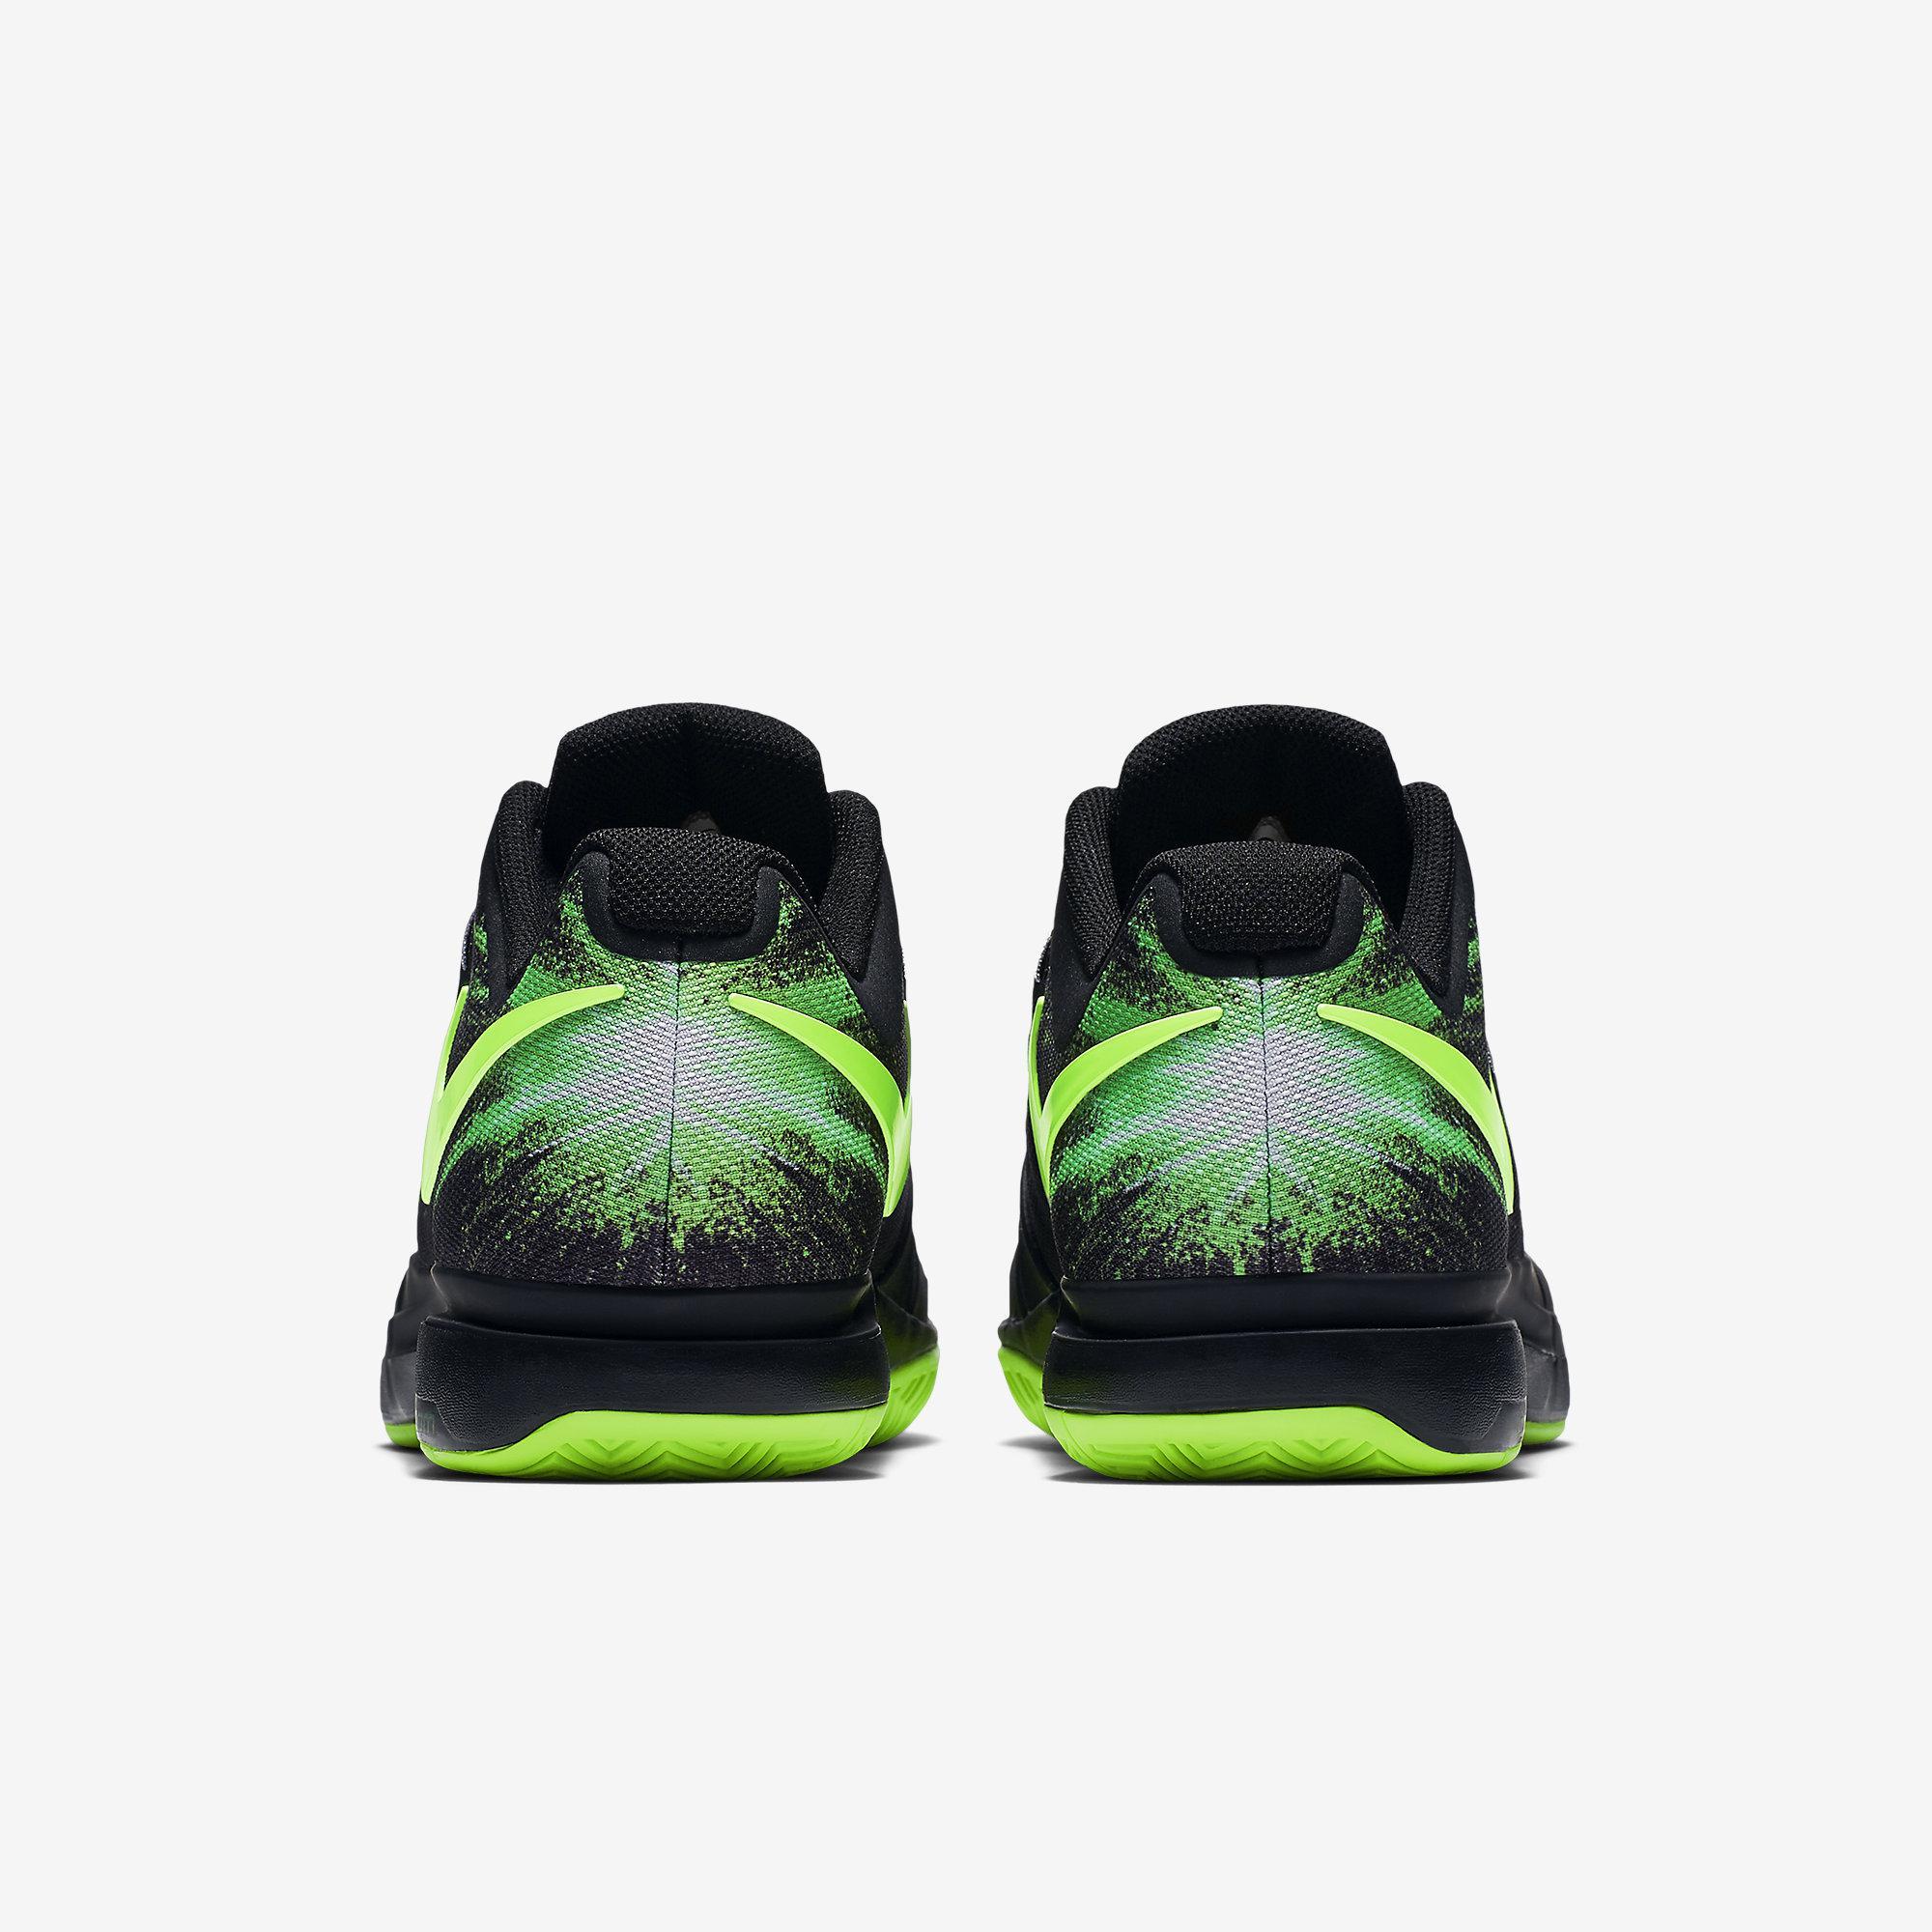 cheap for discount c7d58 e3e7b ... Nike Mens Zoom Vapor 9.5 Tour QS Tennis Shoes - Black Green ...